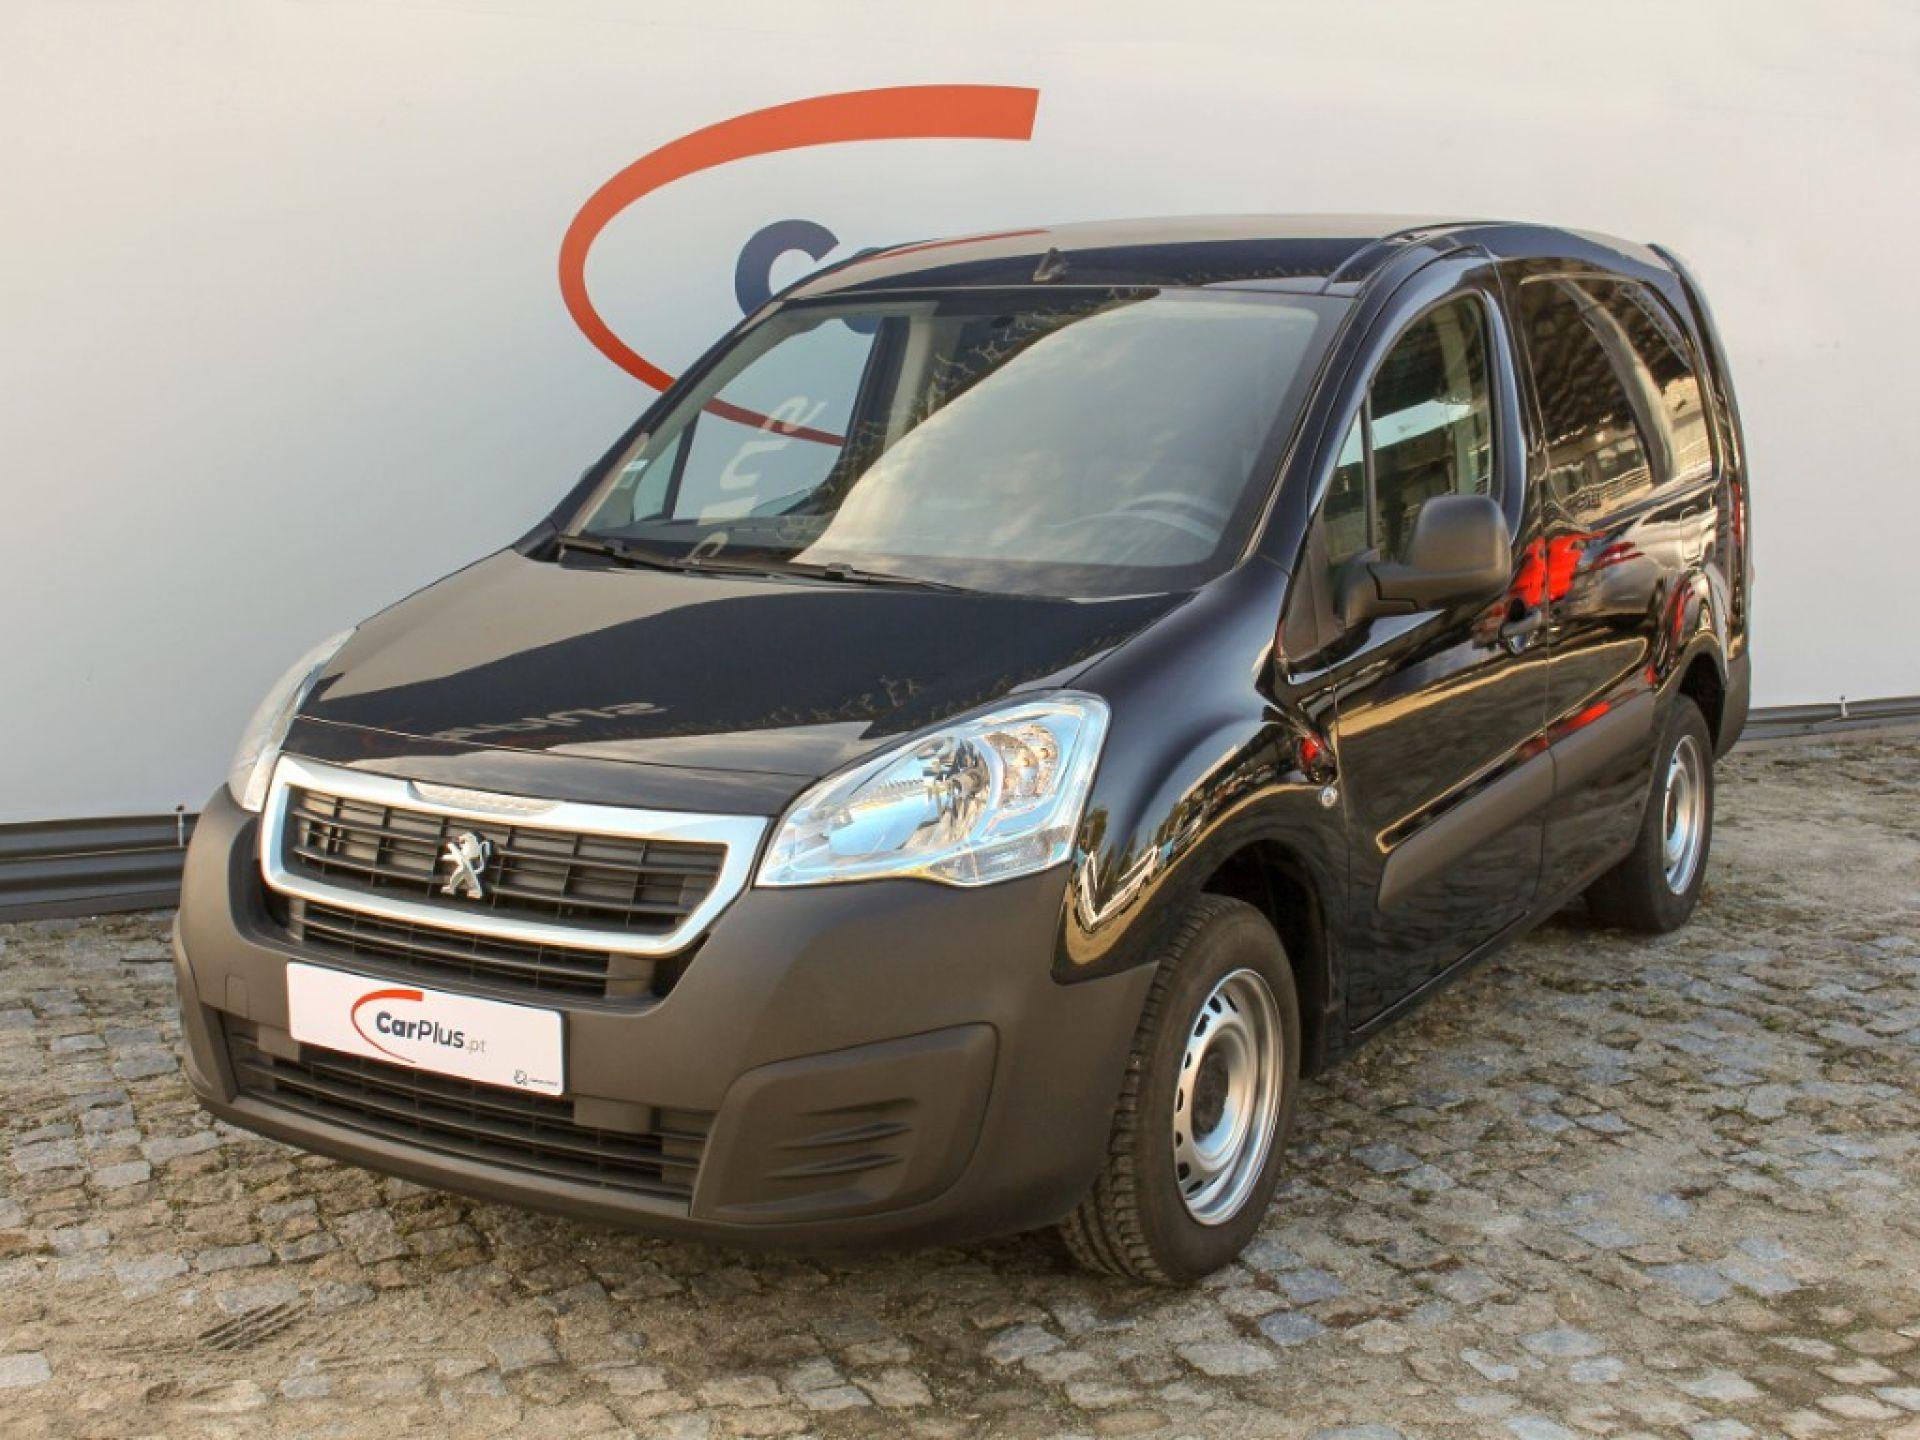 Peugeot Partner L2 Office 1.6 HDI 92 CV  segunda mão Lisboa